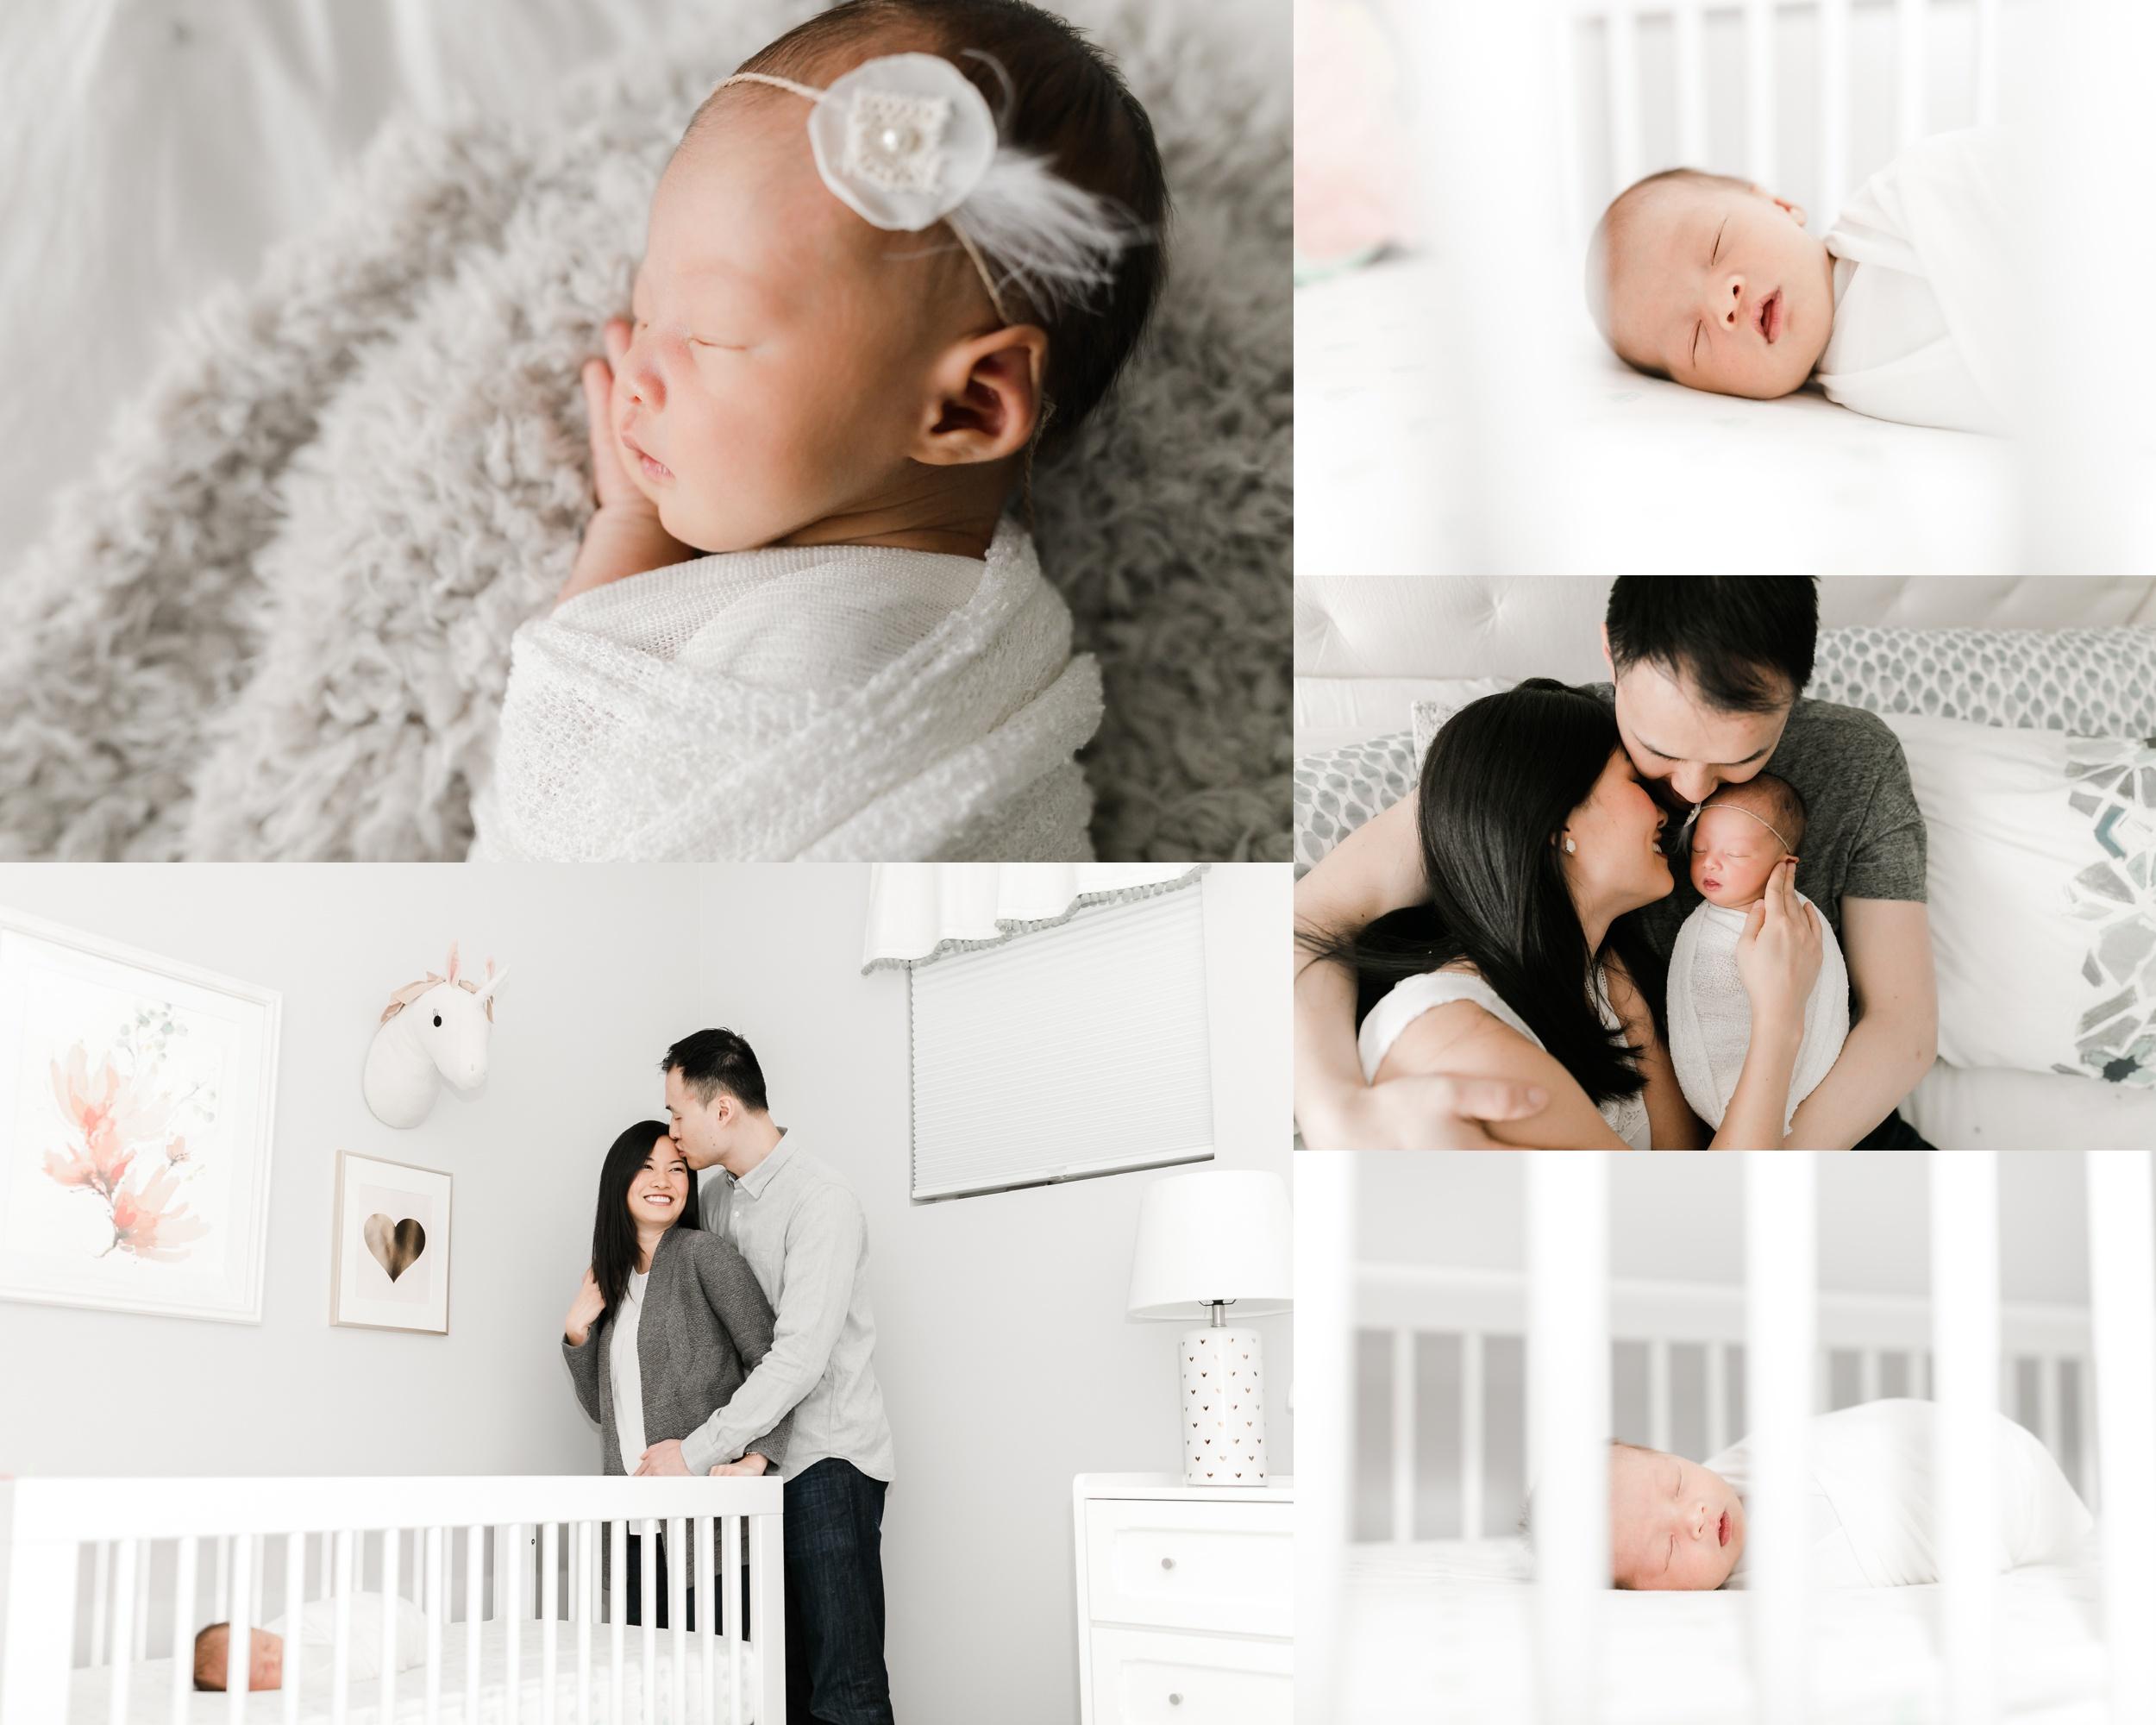 chicago-newborn-family-lifestyle-photographer-jenny-grimm-photography_0004.jpg